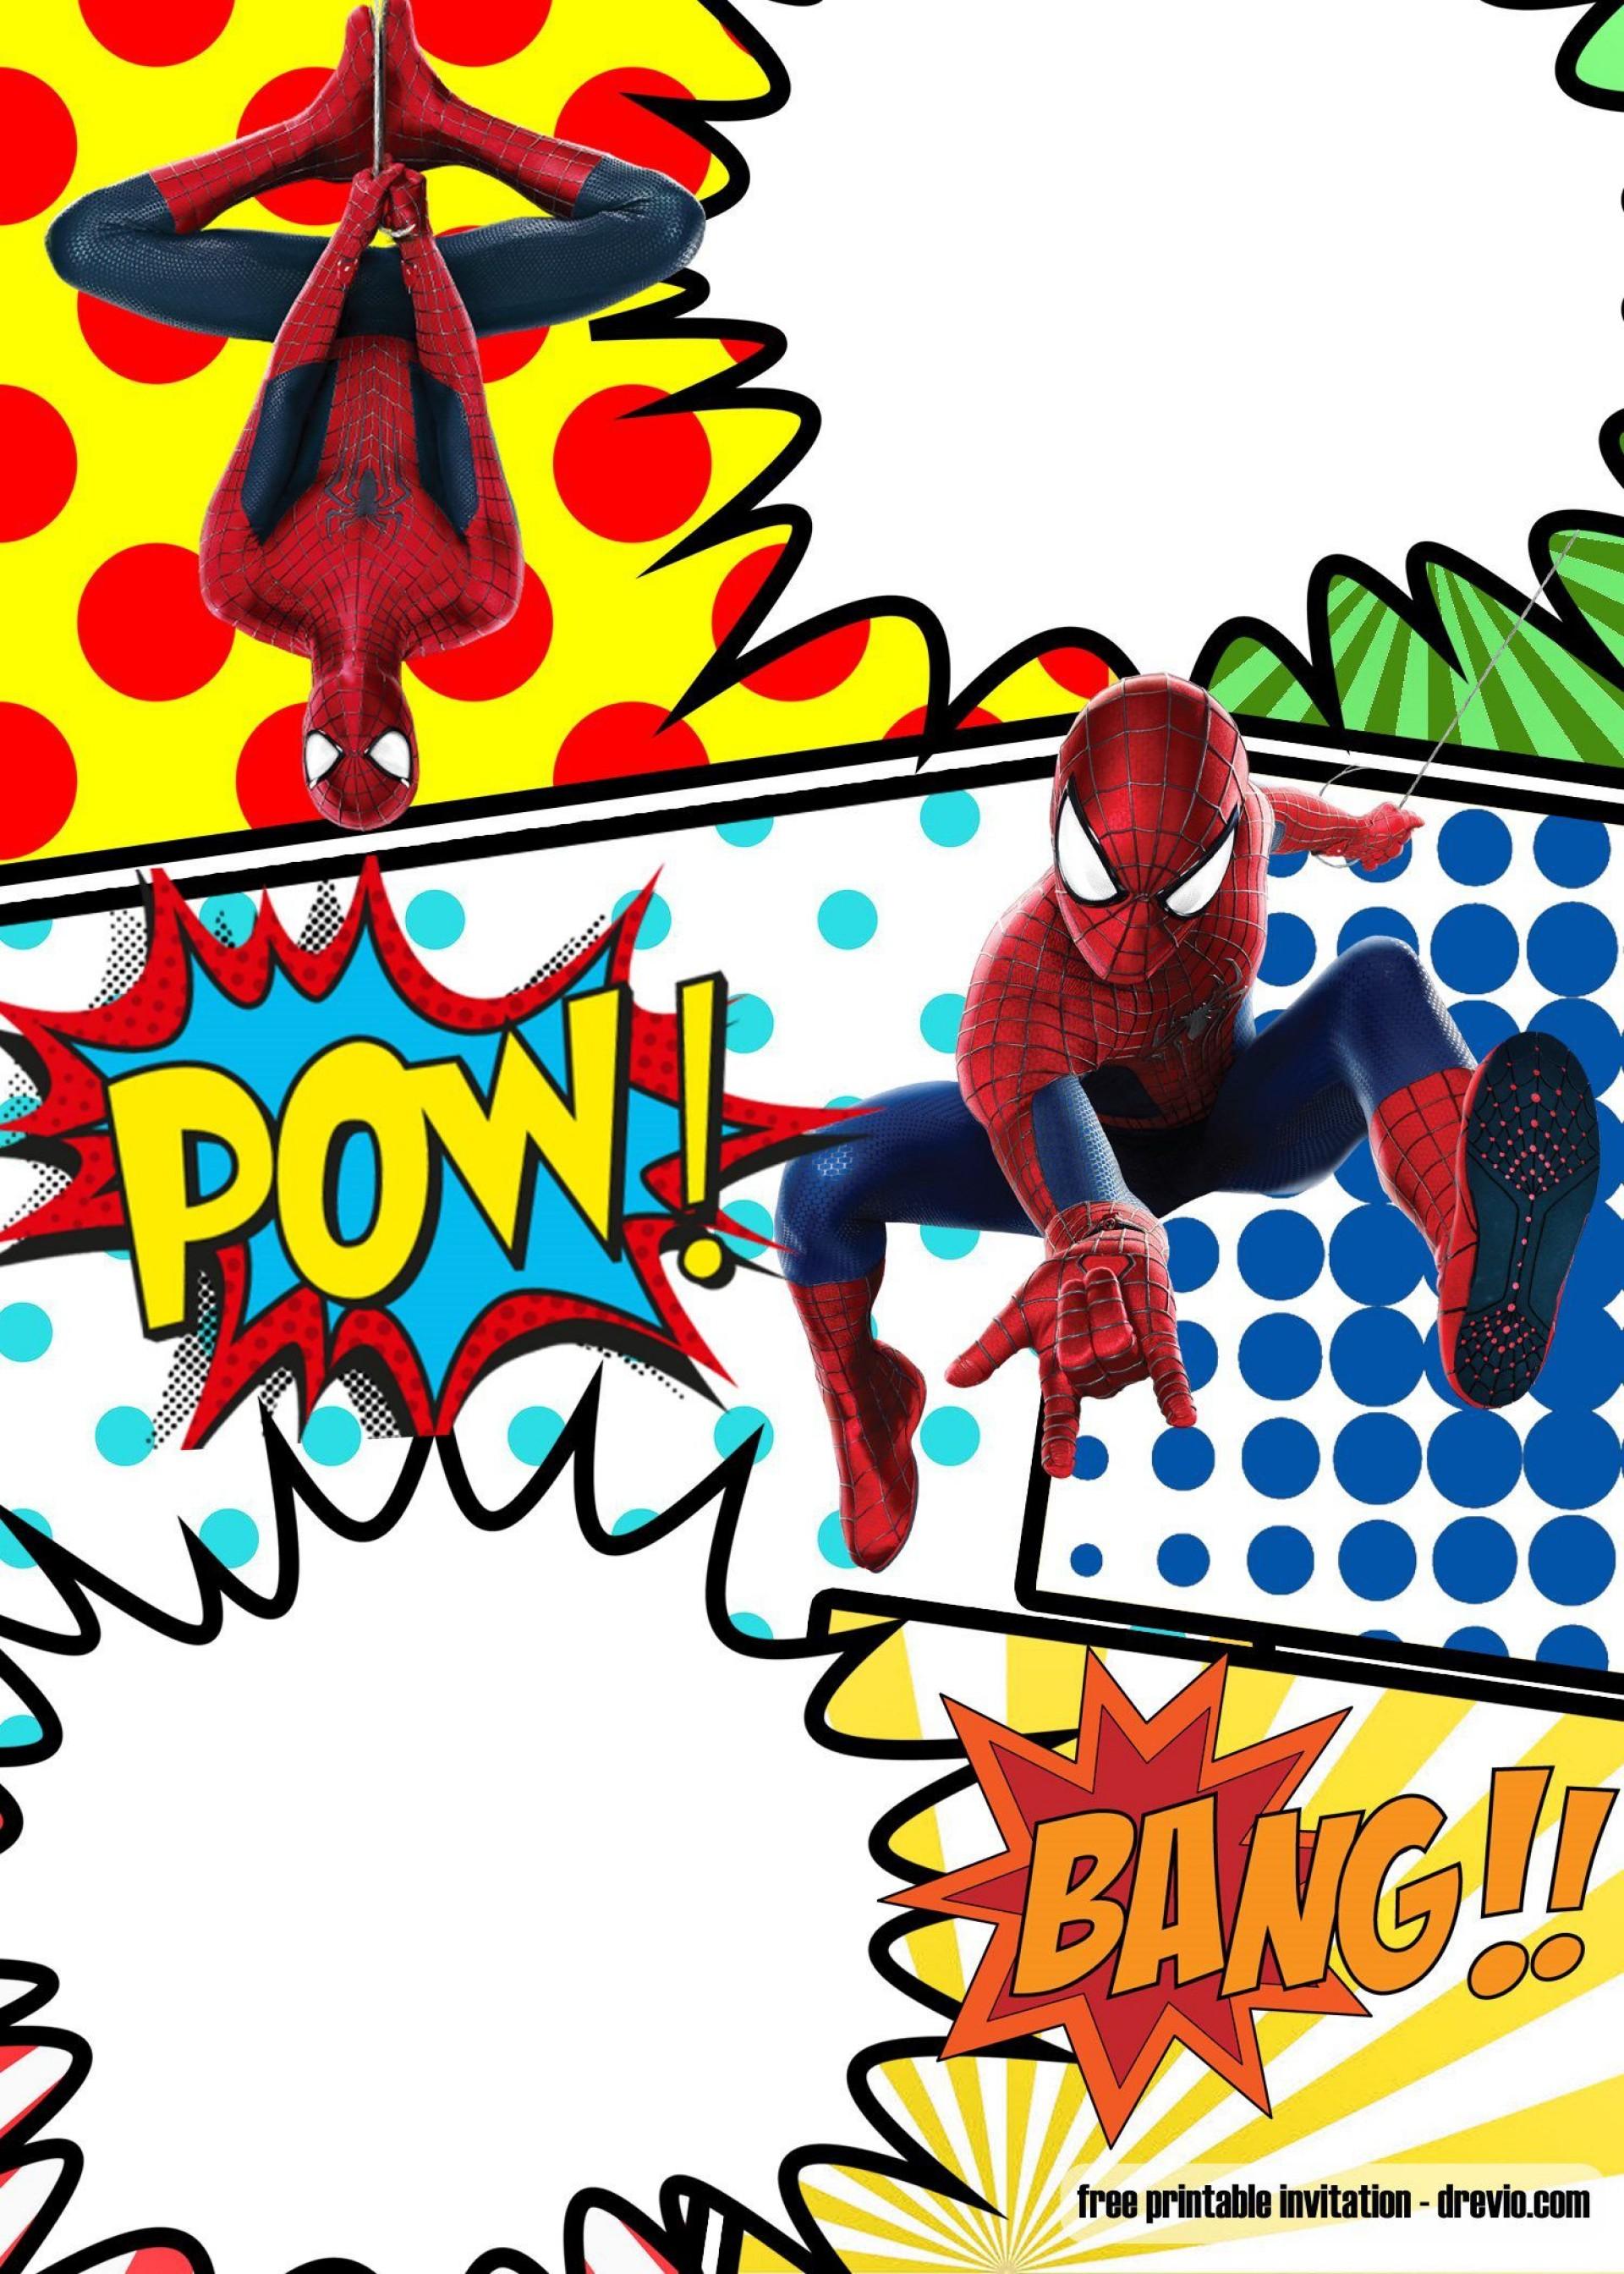 008 Top Superhero Birthday Party Invitation Template Free Image  Invite1920